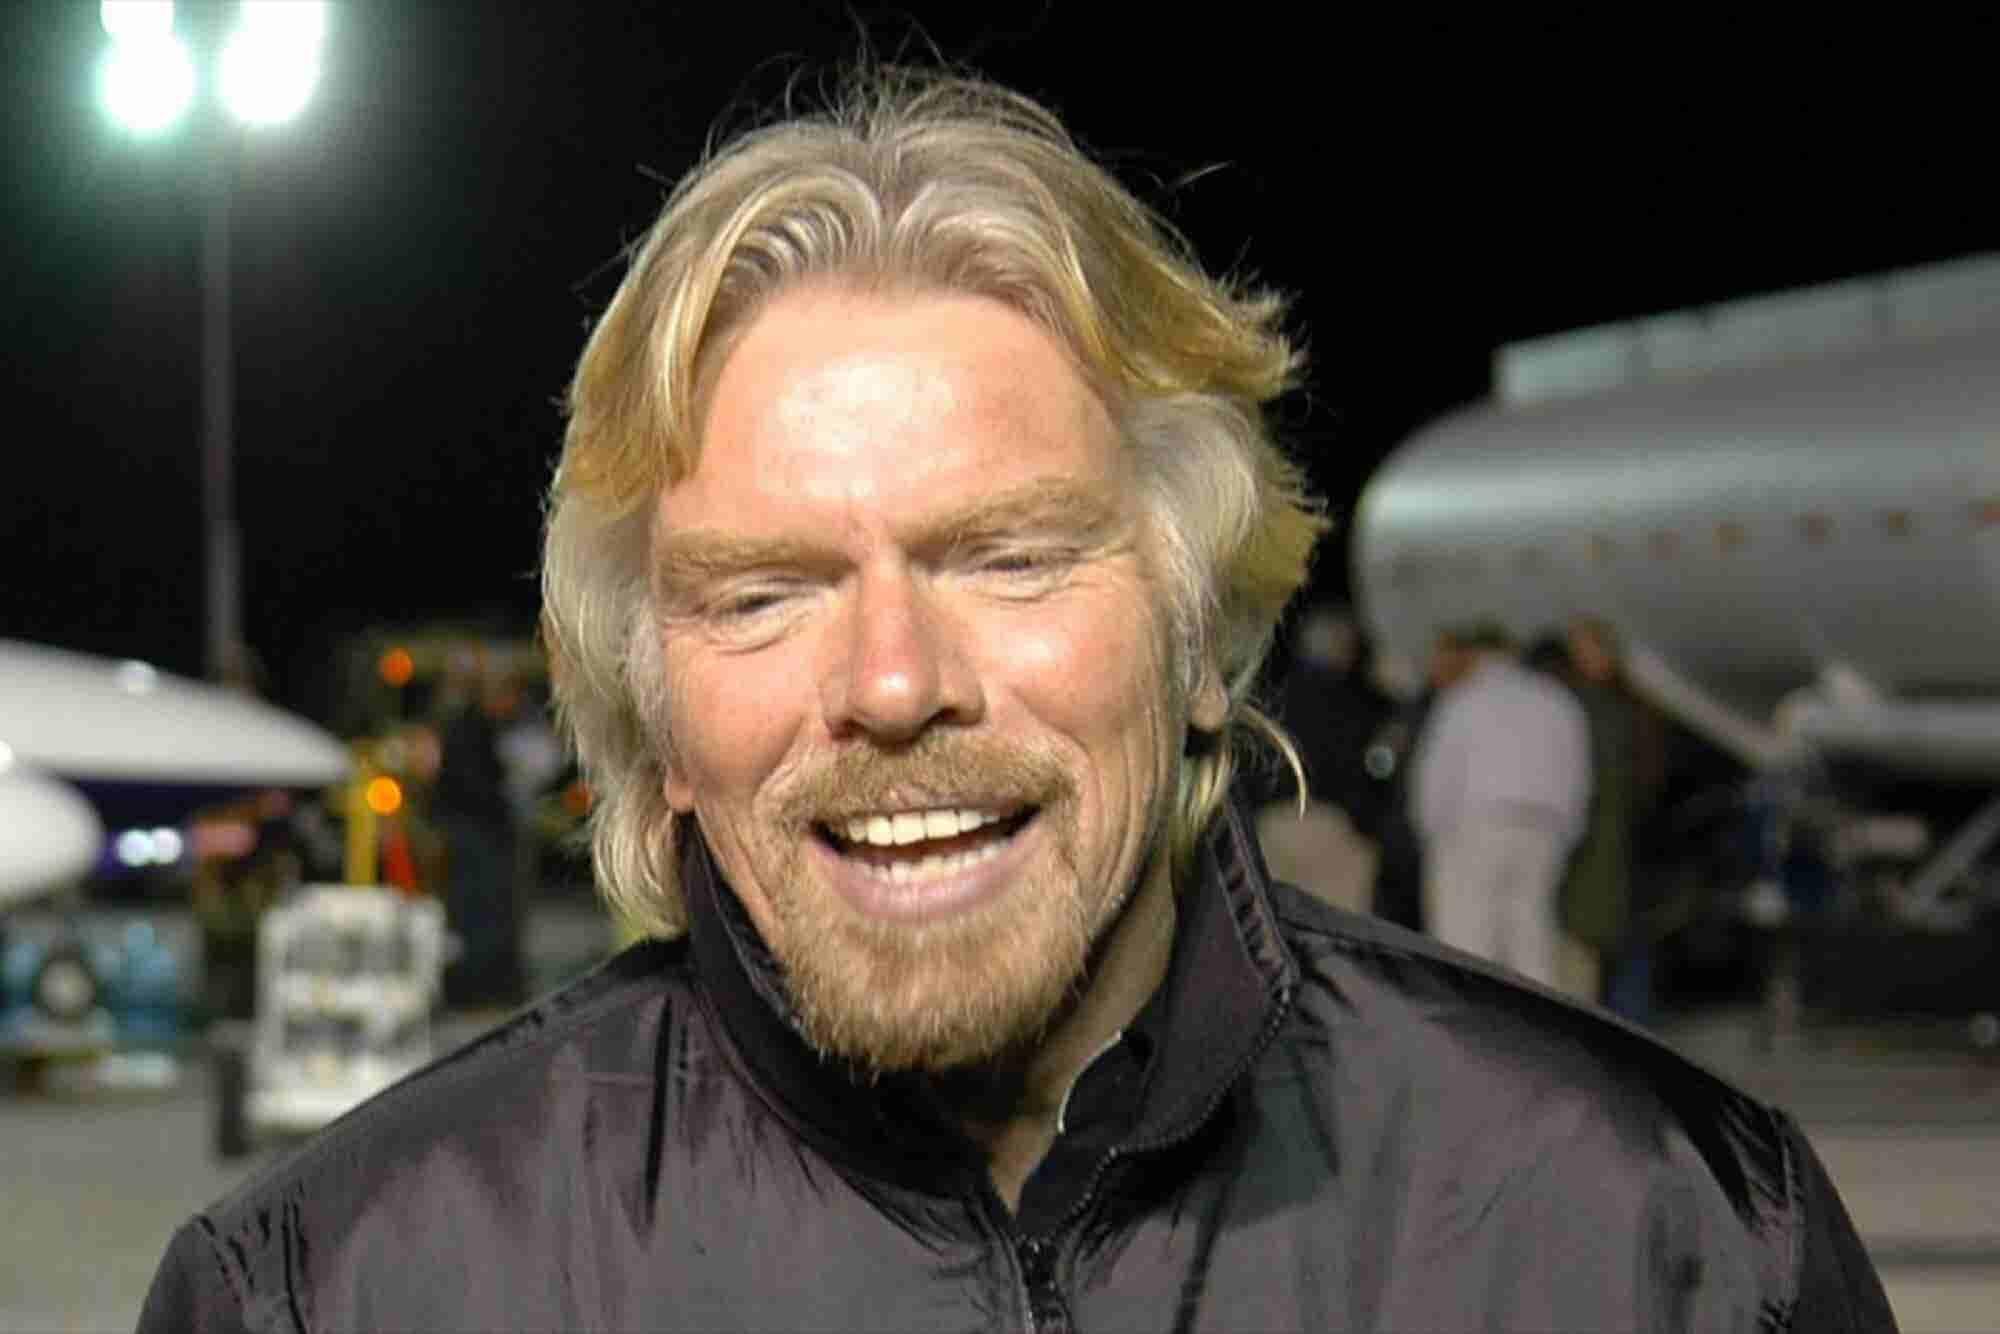 The World Needs More of Richard Branson's 'Hubris'